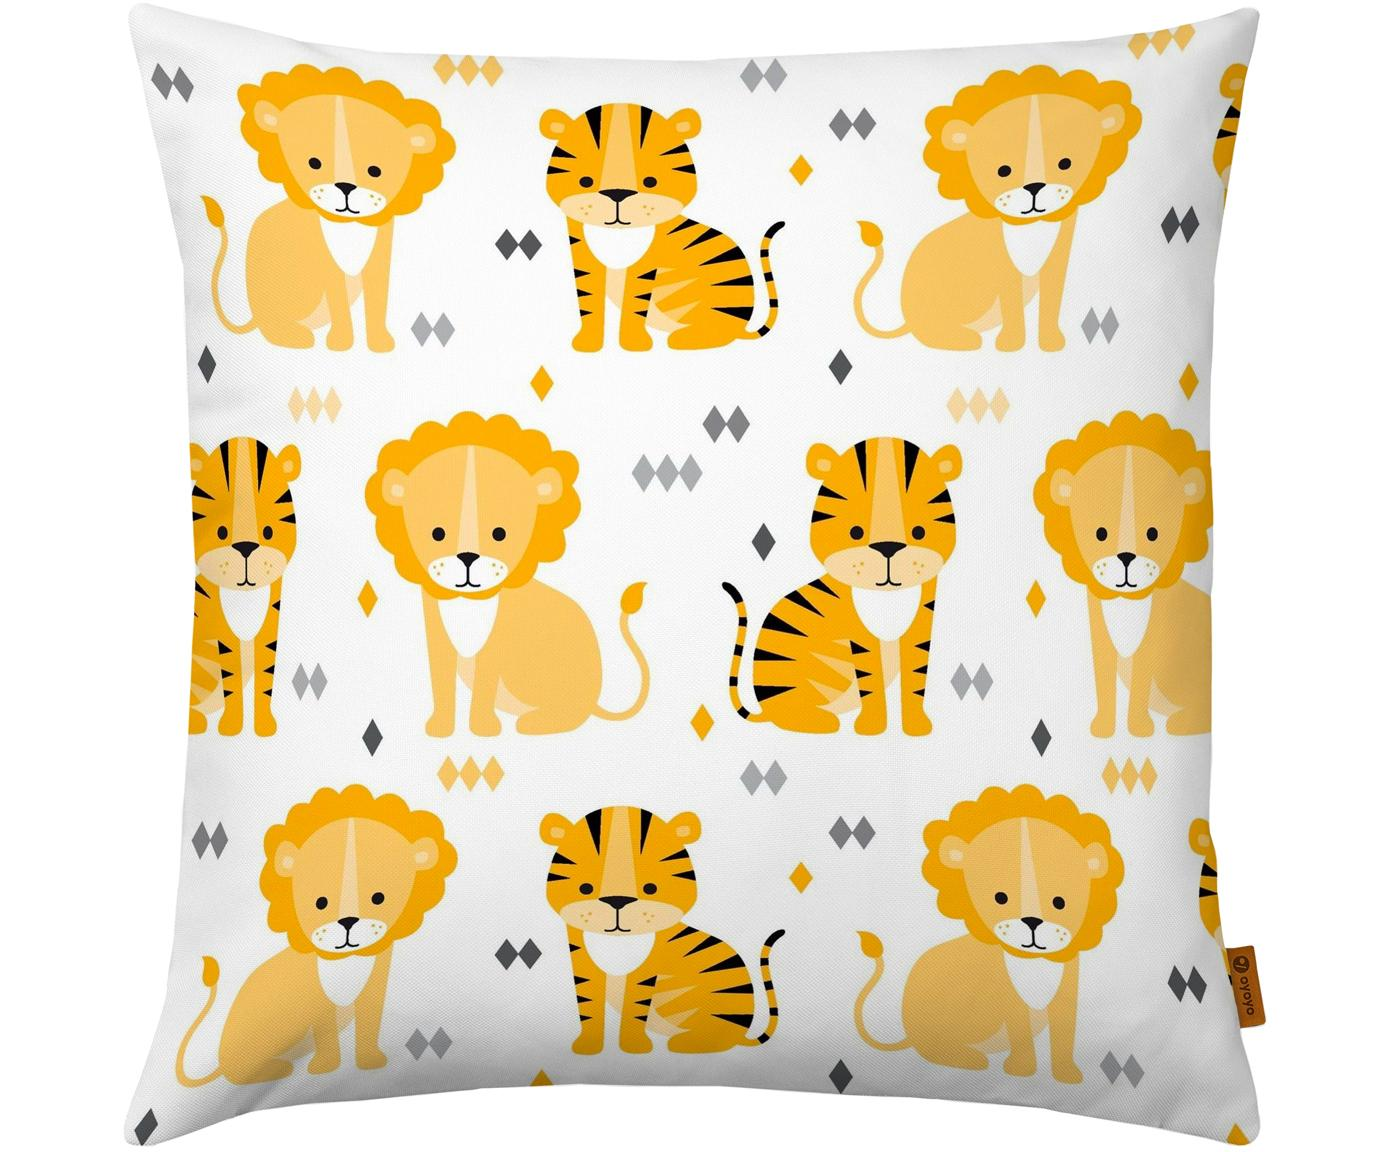 Funda de cojín Lion and Tiger, Algodón, Blanco, amarillo, naranja, gris, negro, An 40 x L 40 cm